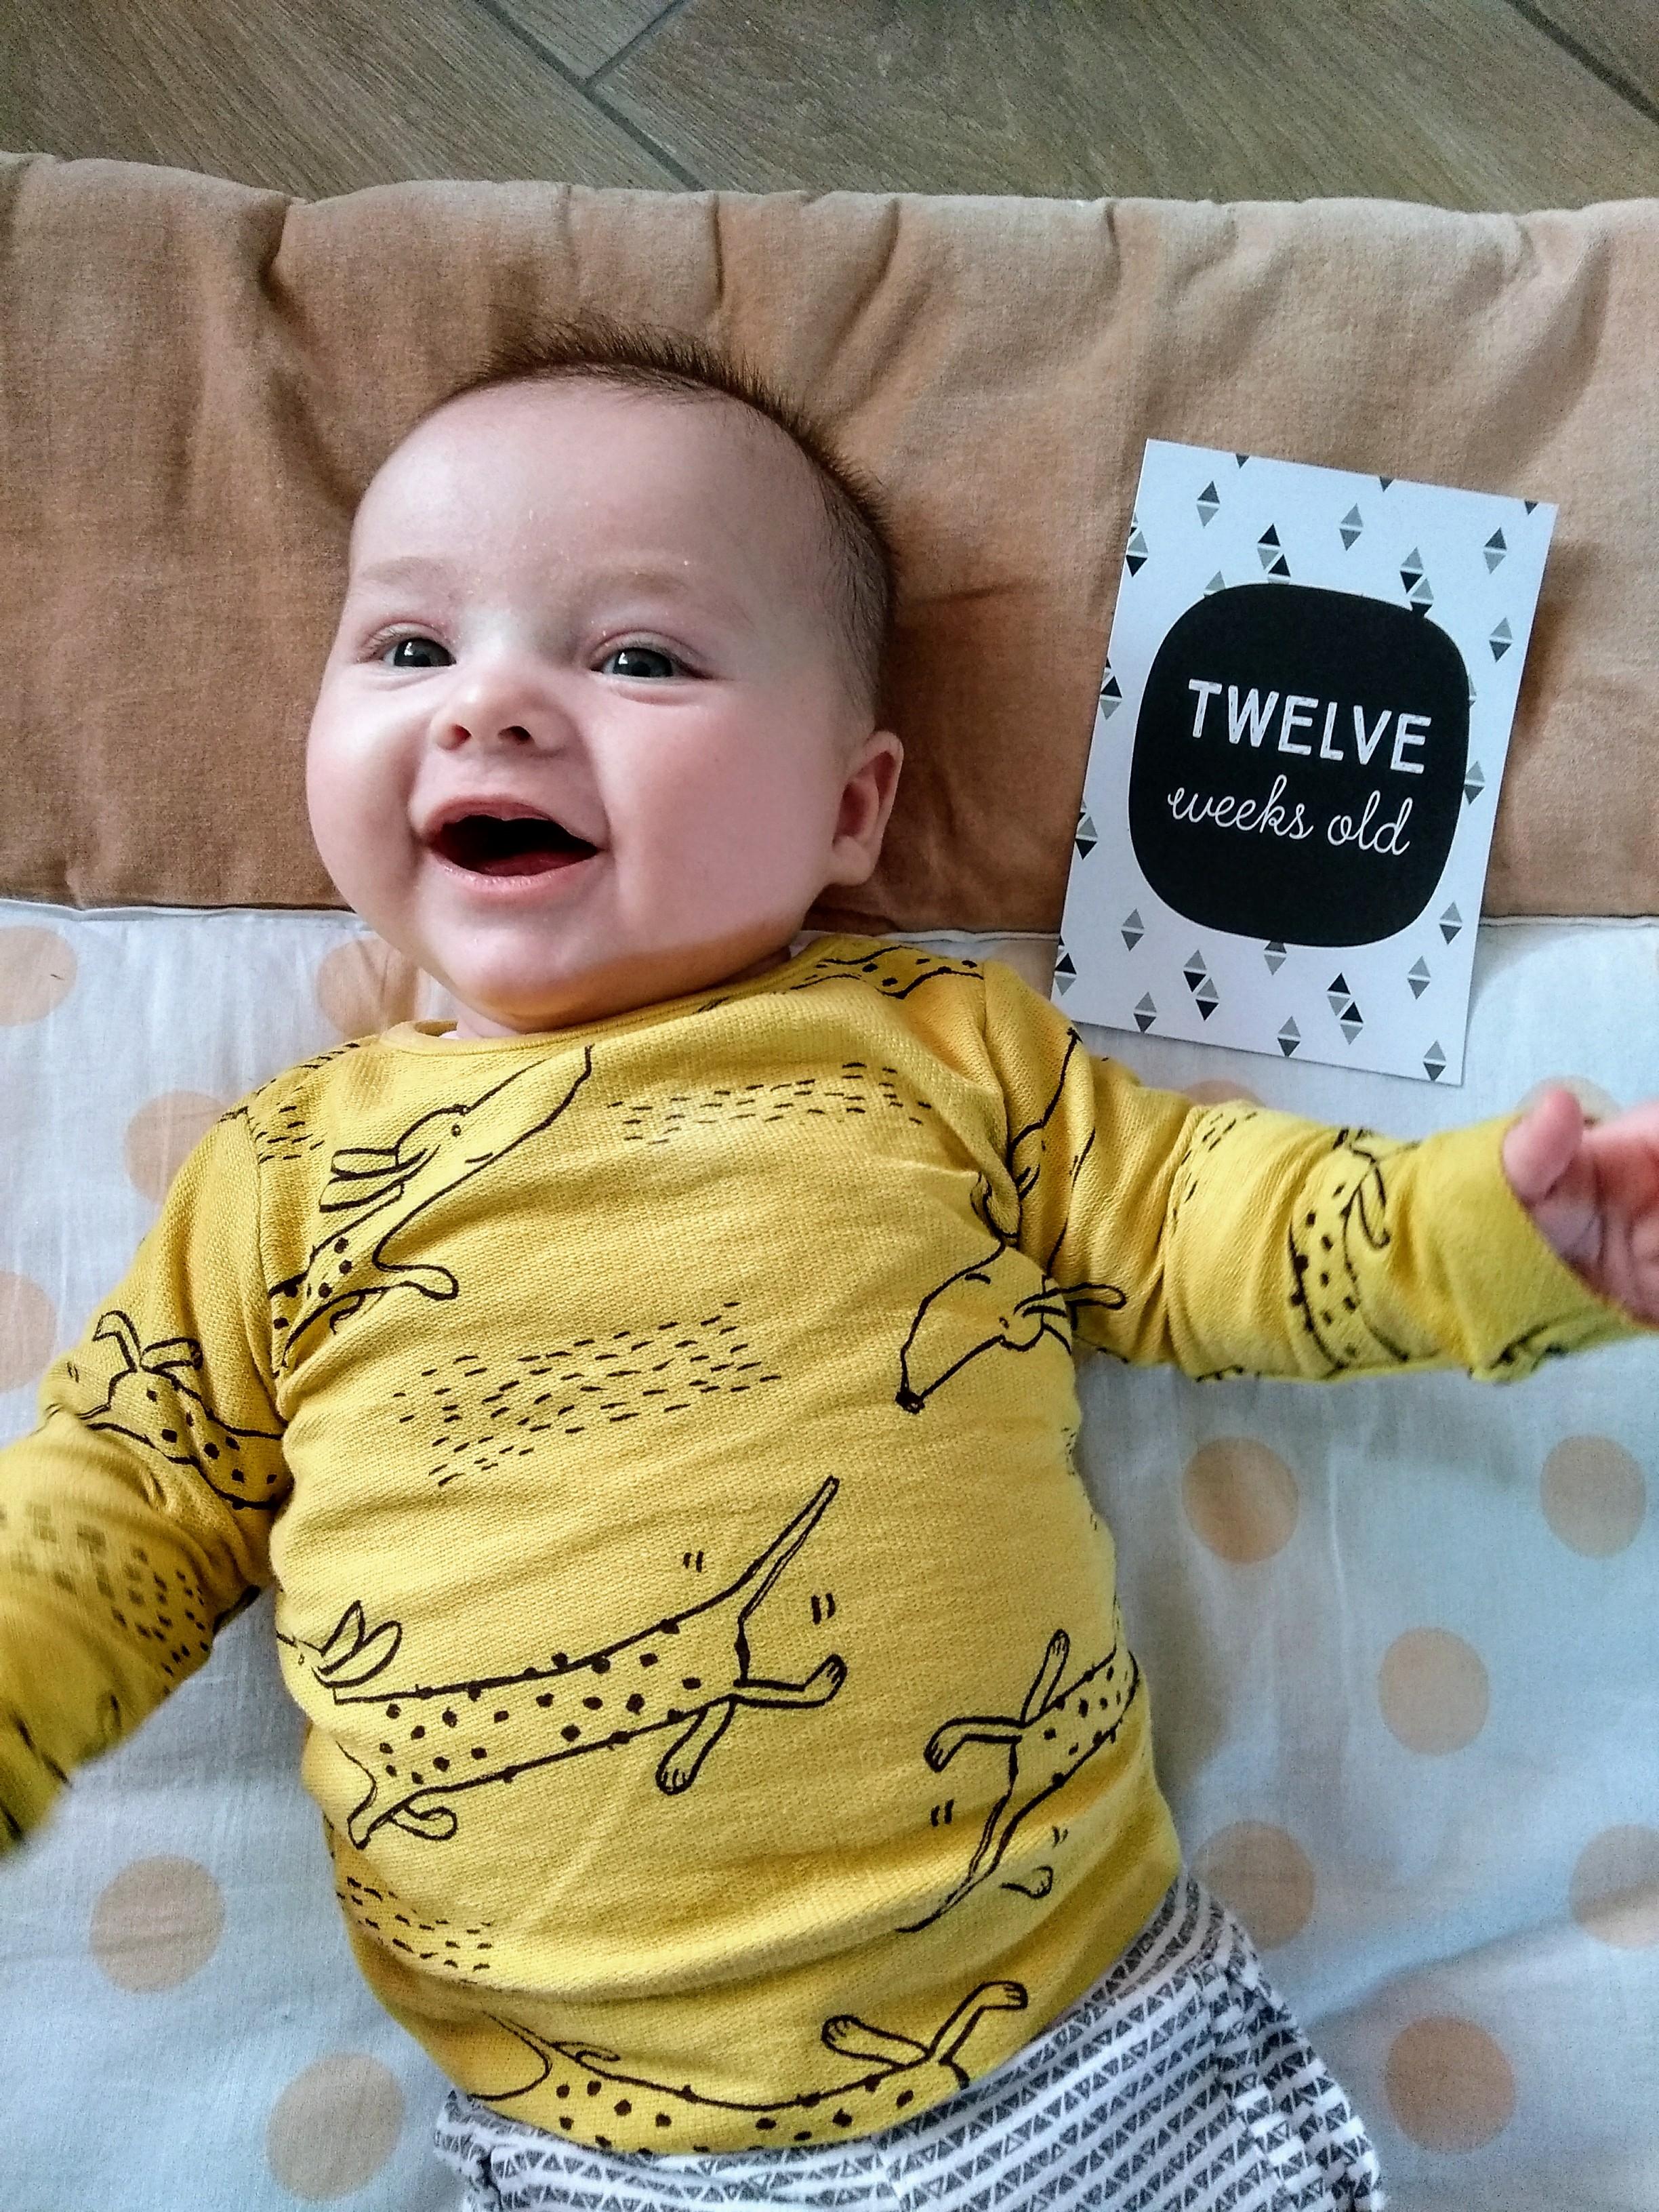 12 weken, new born, baby, baby 12 weken, baby 3 maanden, mamablog, gezin, mamalifestyle, momlife, lalogblog, lalog, lalog.nl